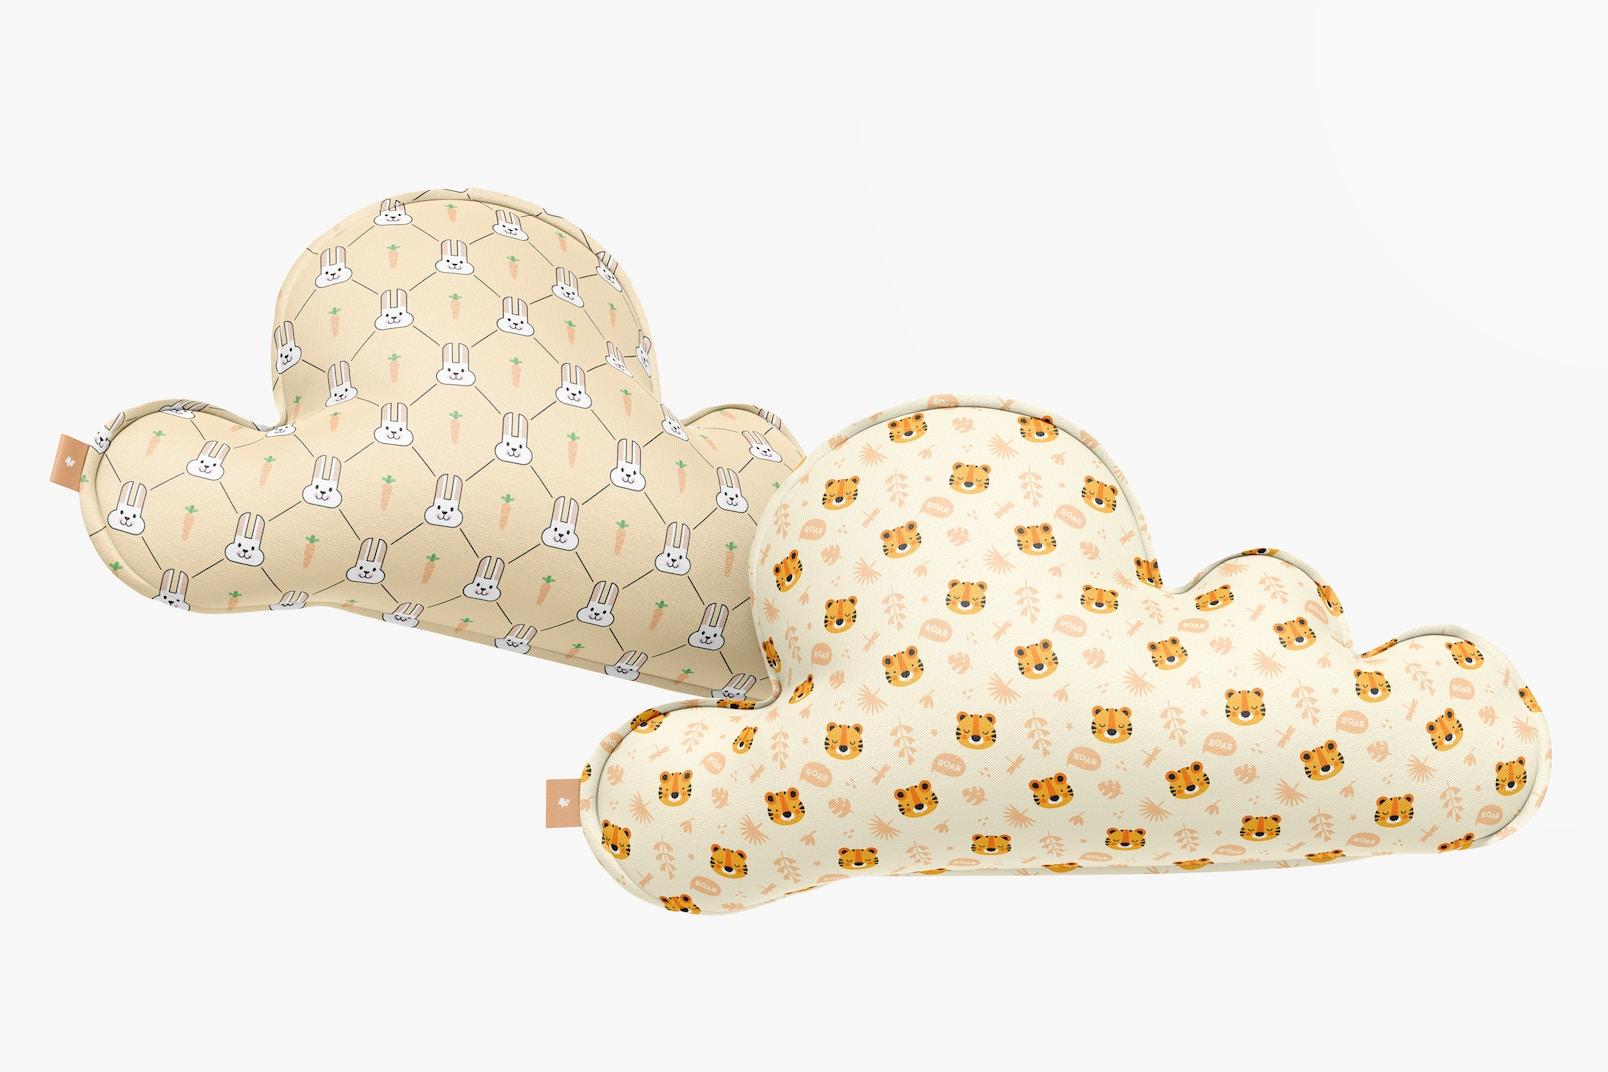 Cloud Pillows Mockup, Floating